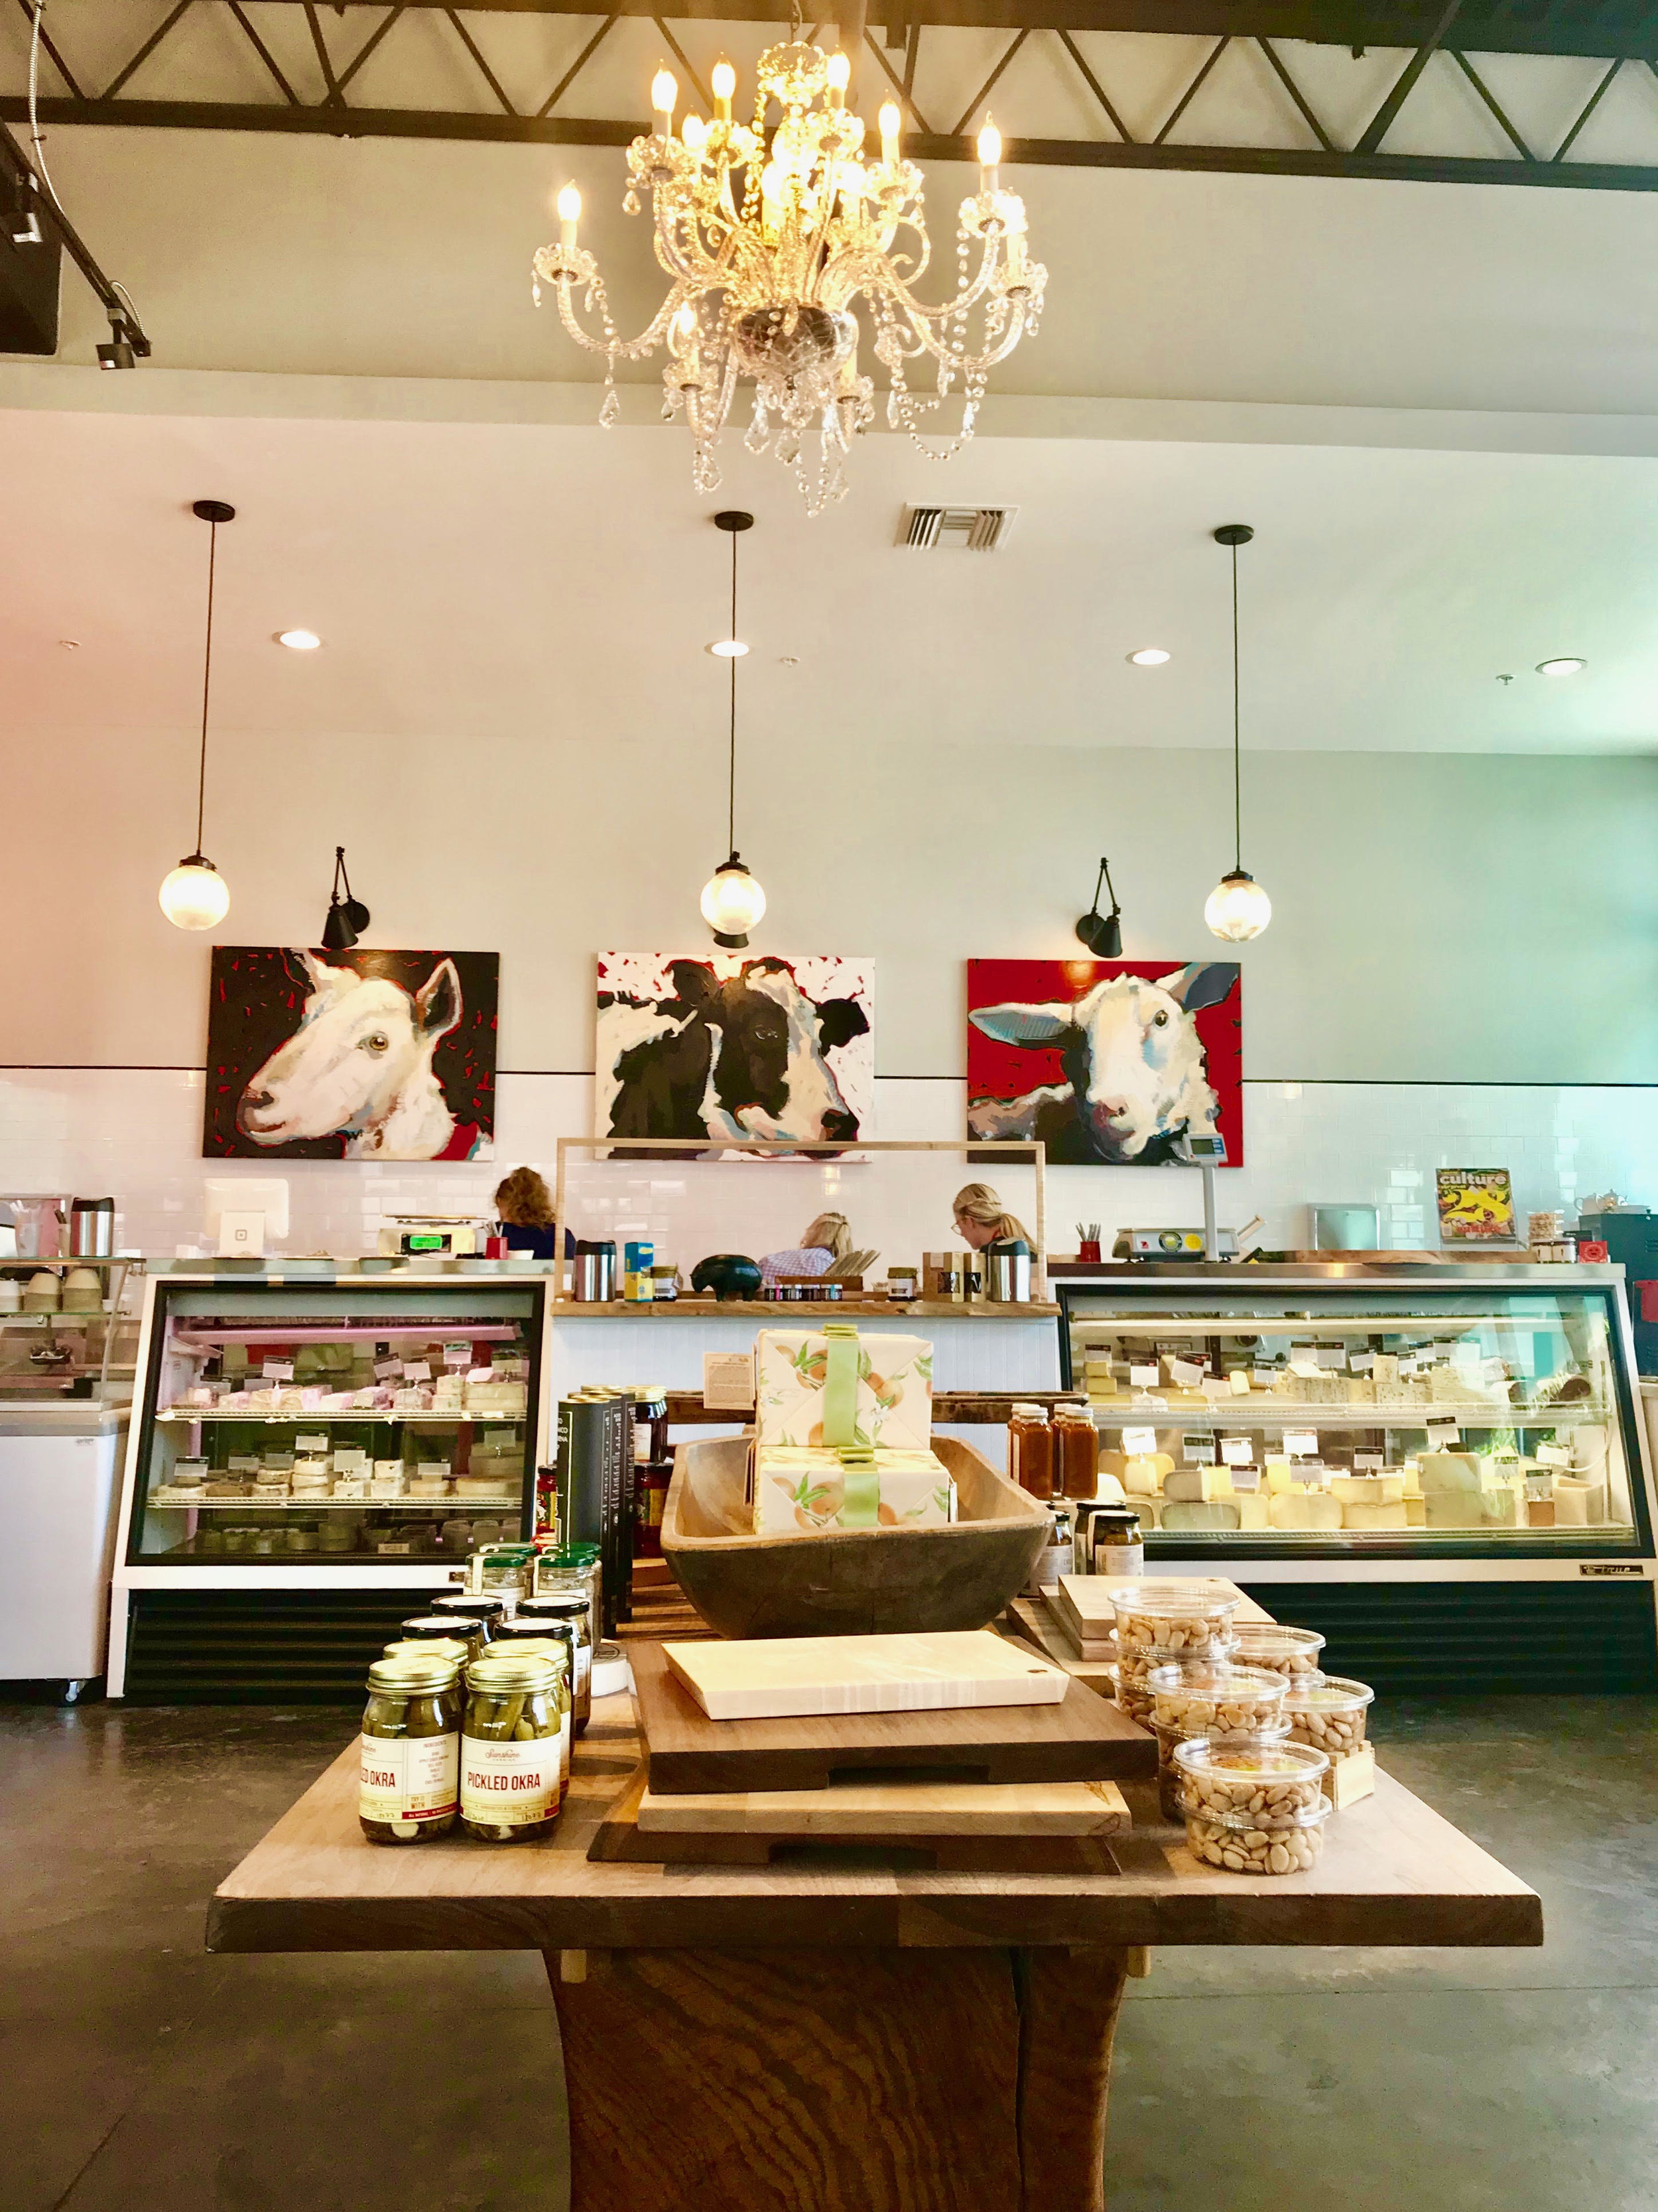 Installation, Artisan Cheese Company, Sarasota, FL